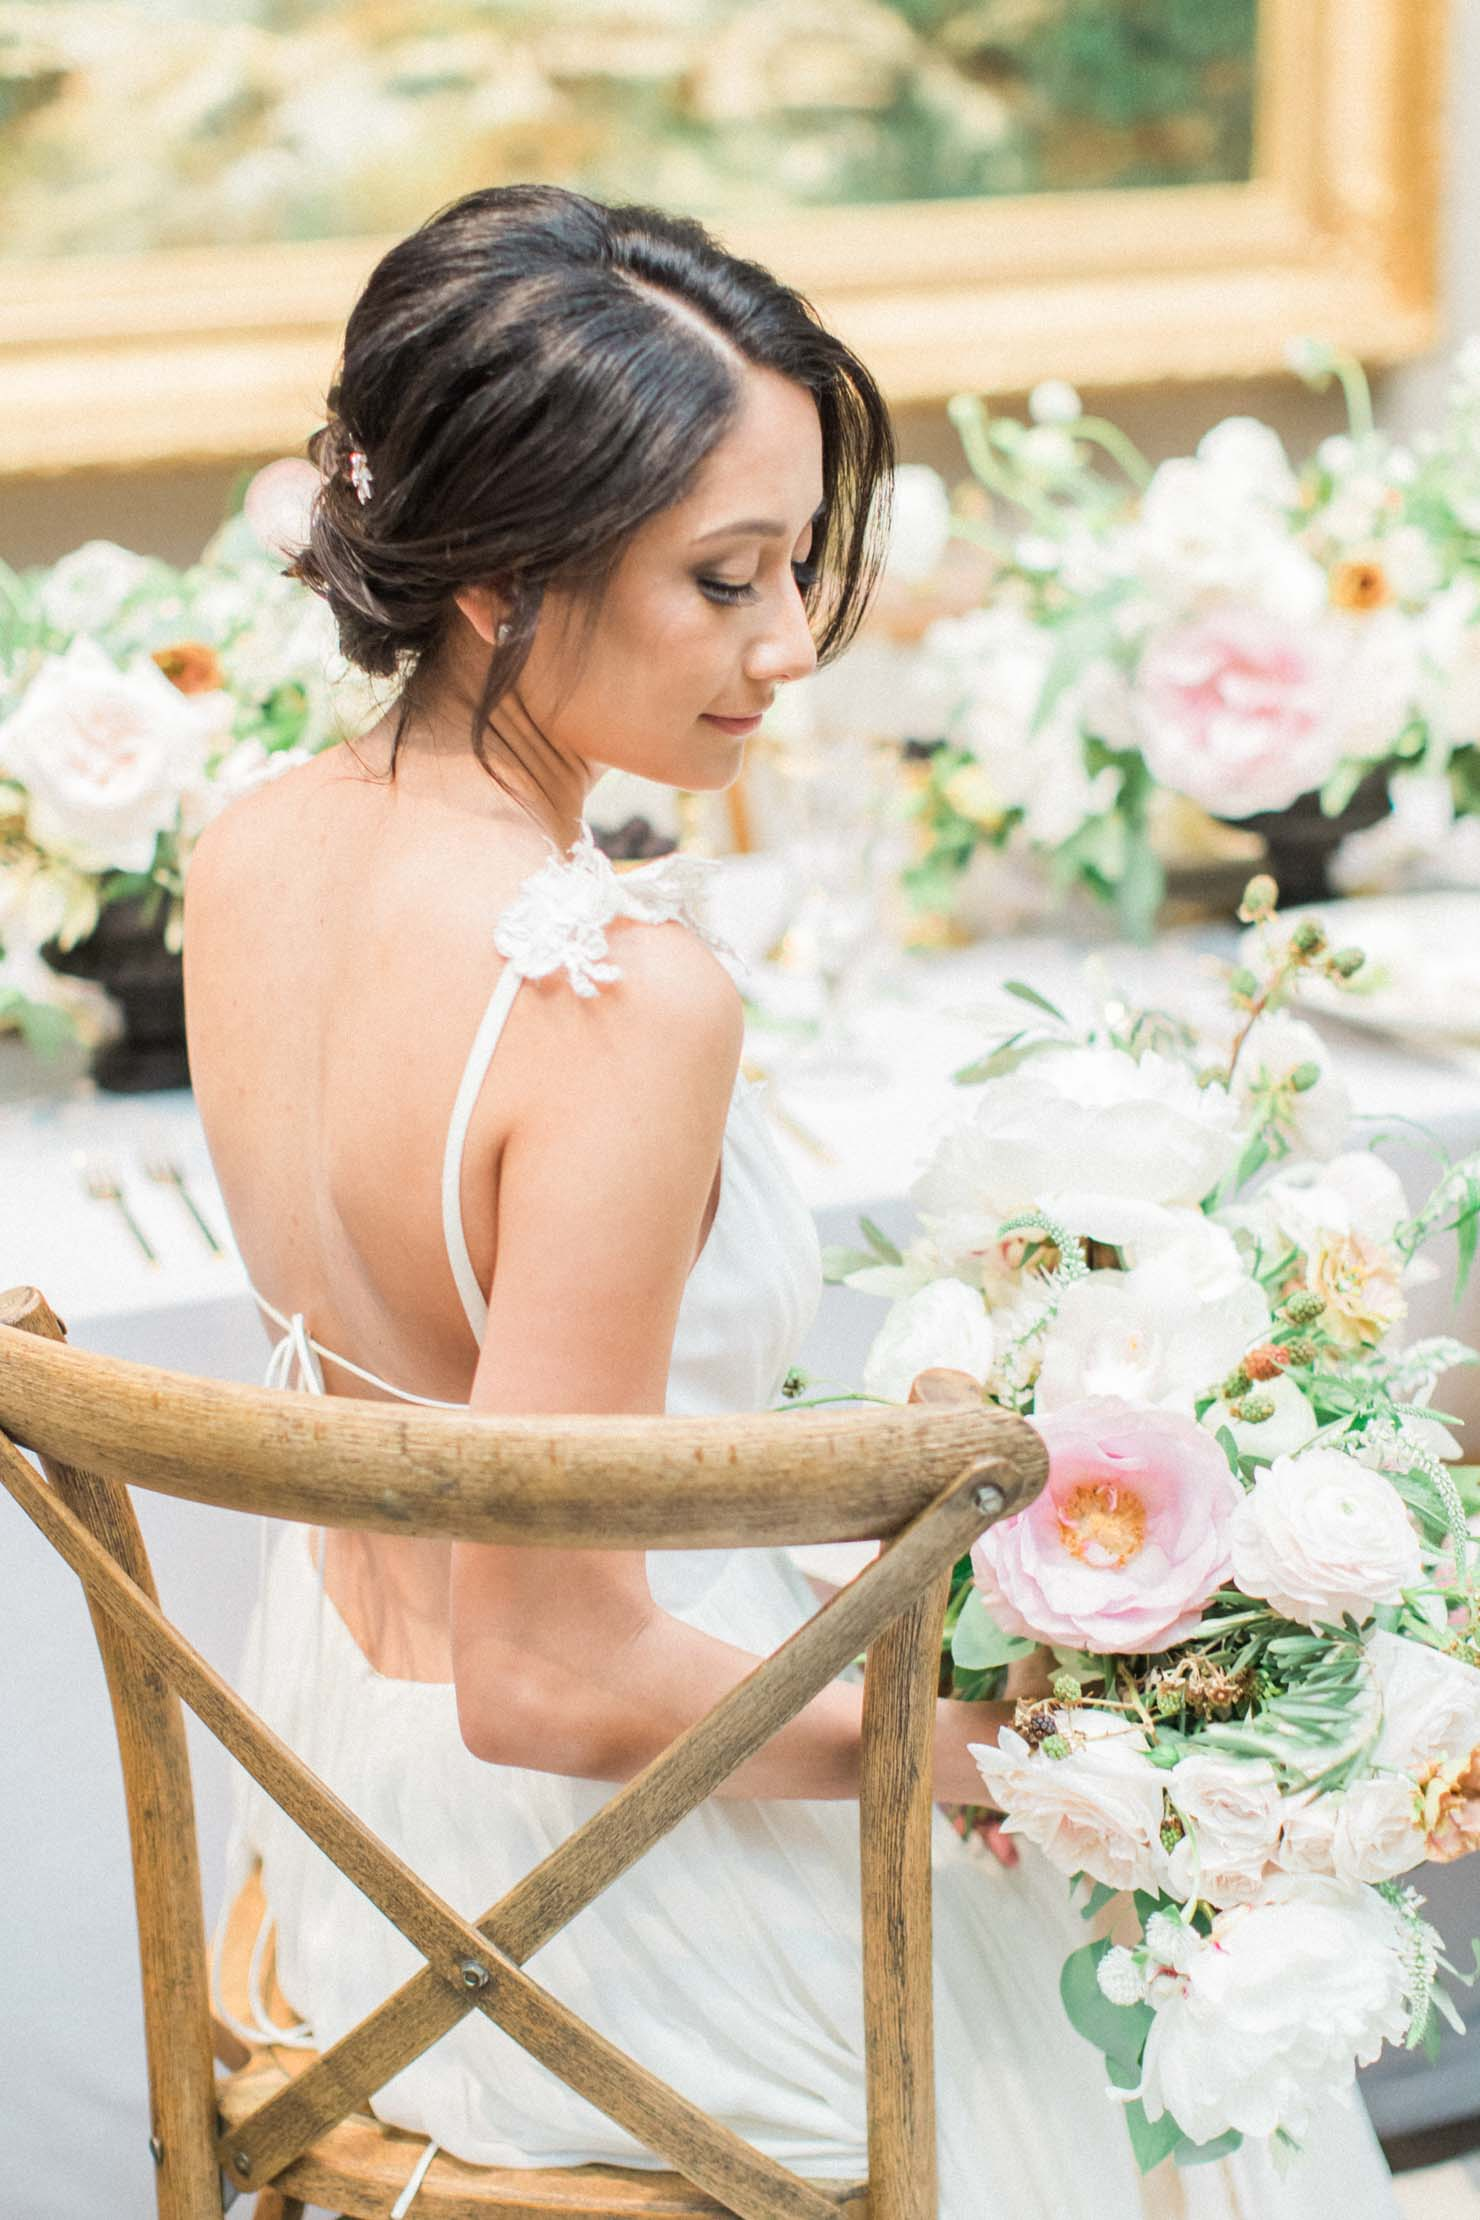 Lilly Beltran of Daily Craving blog celebrates 10 year wedding anniversary